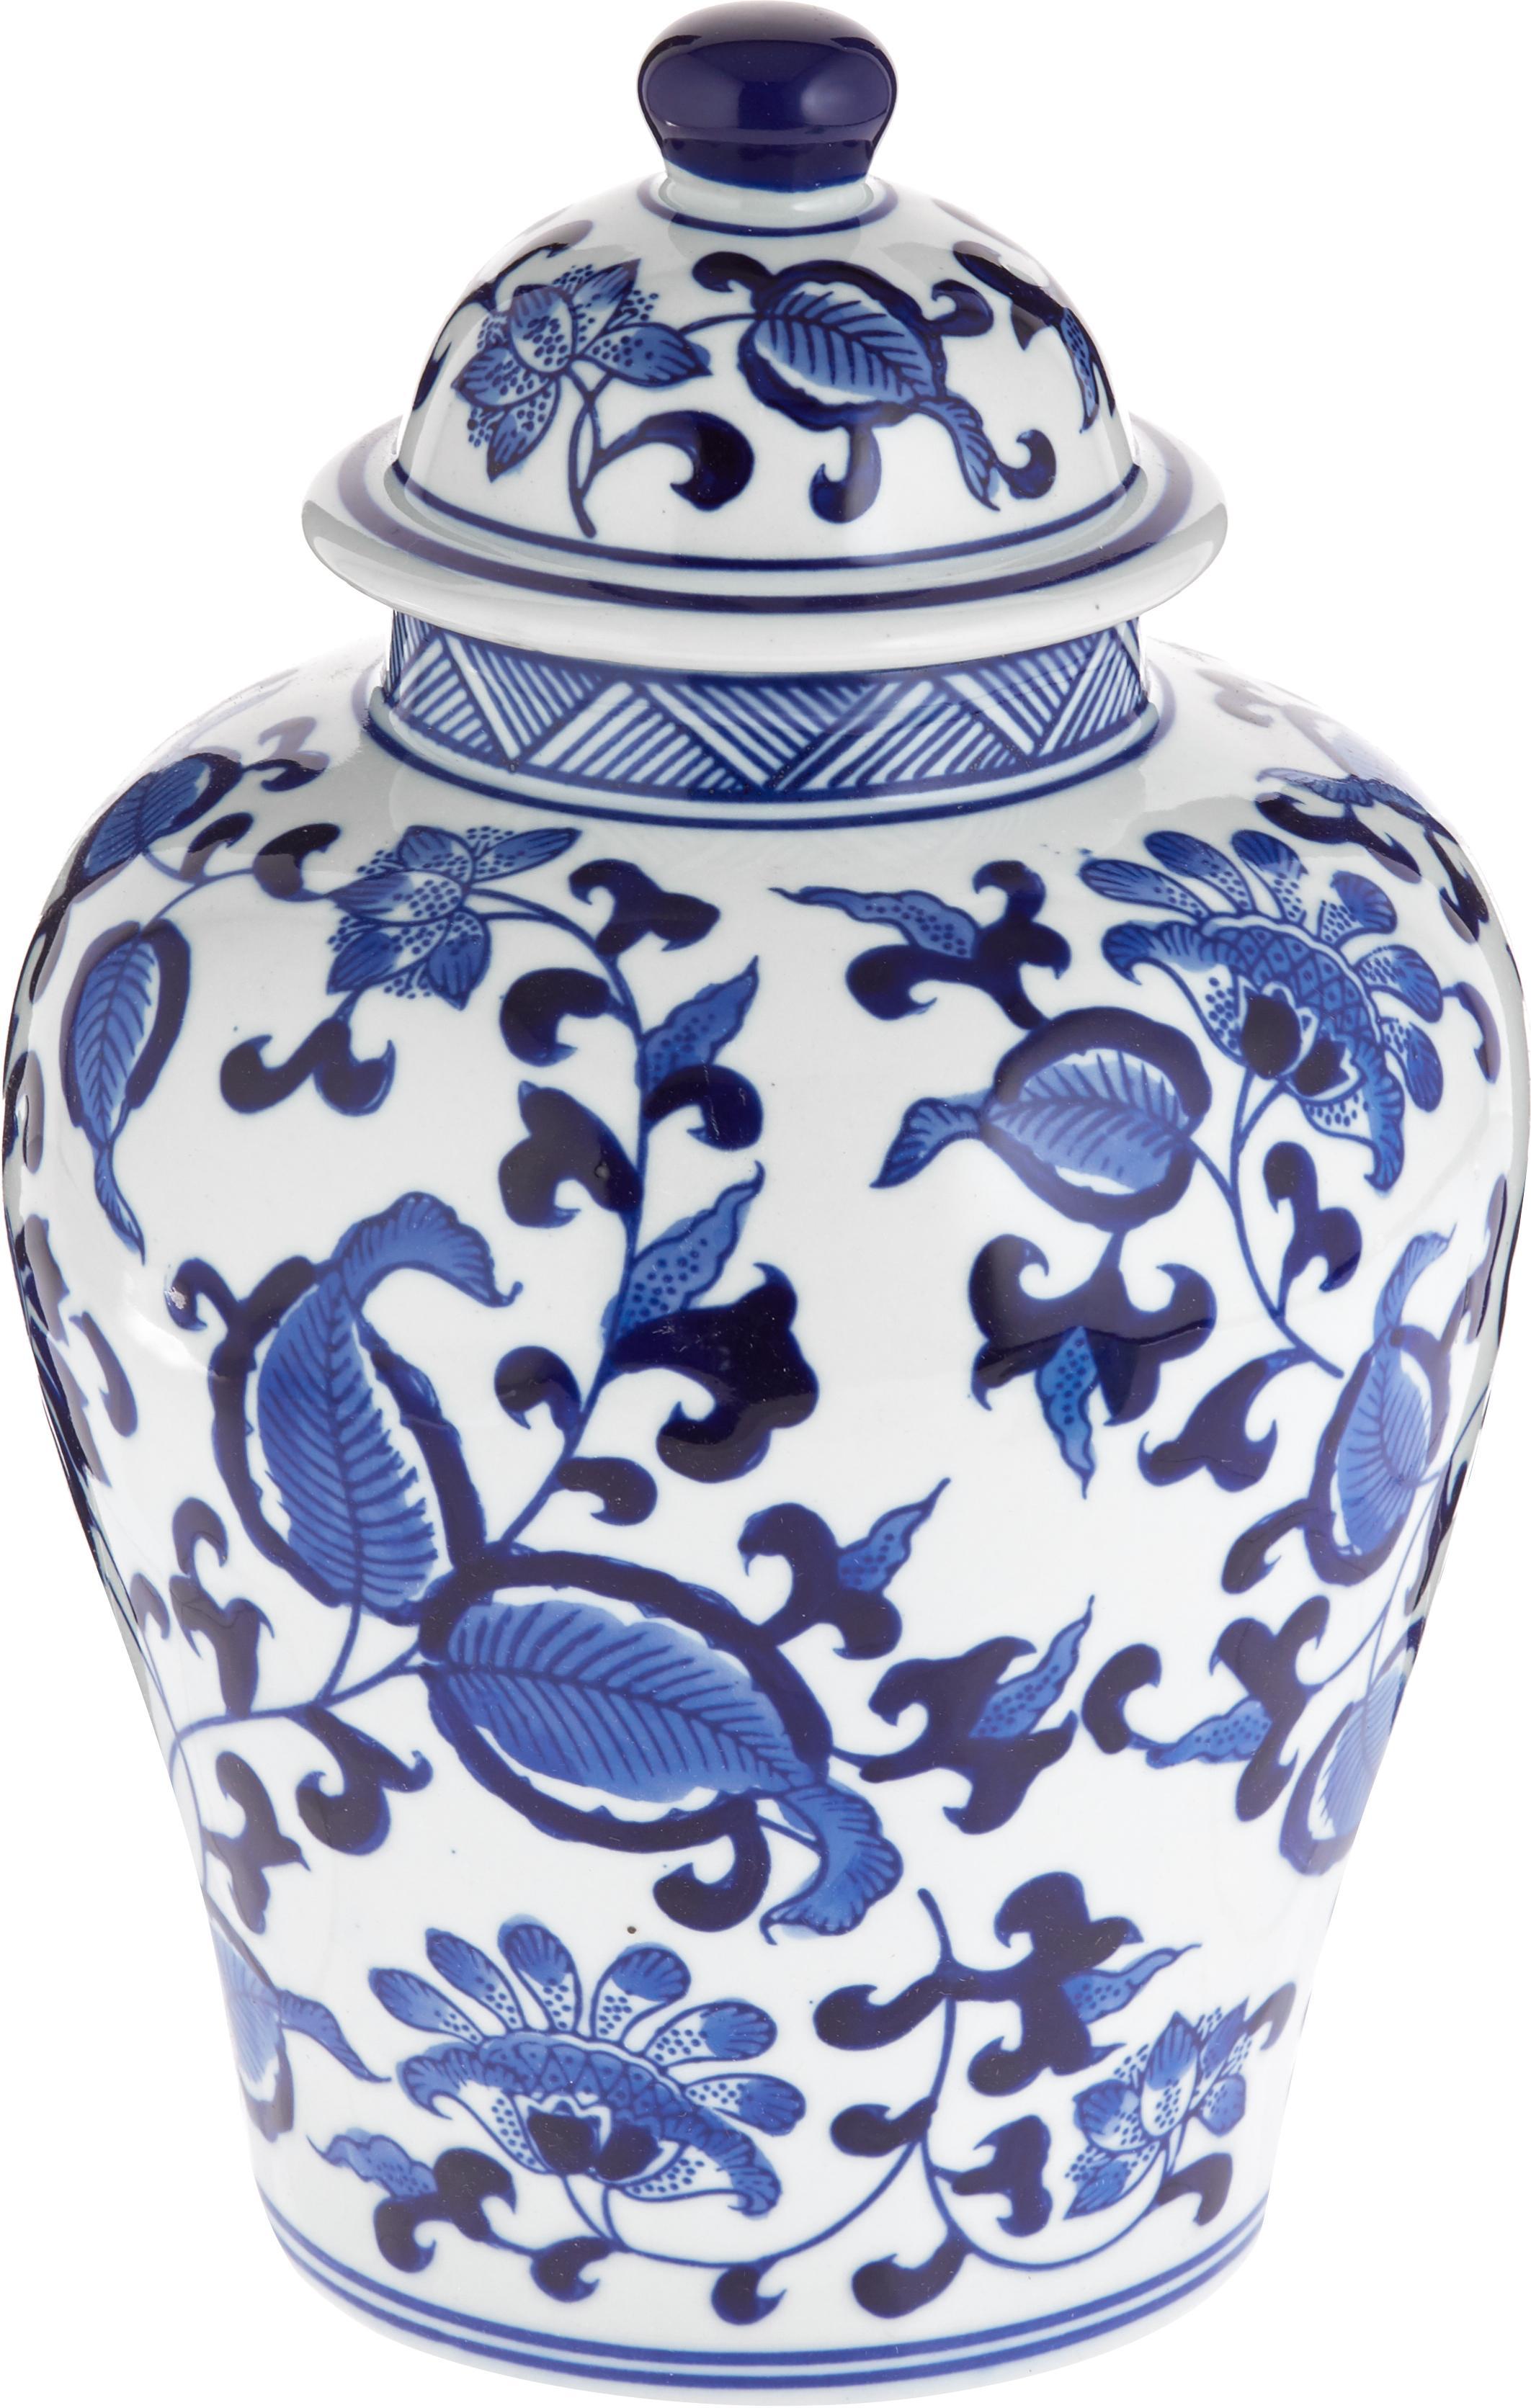 Tibor de porcelana Annabelle, Porcelana, Azul, blanco, Ø 16 cm